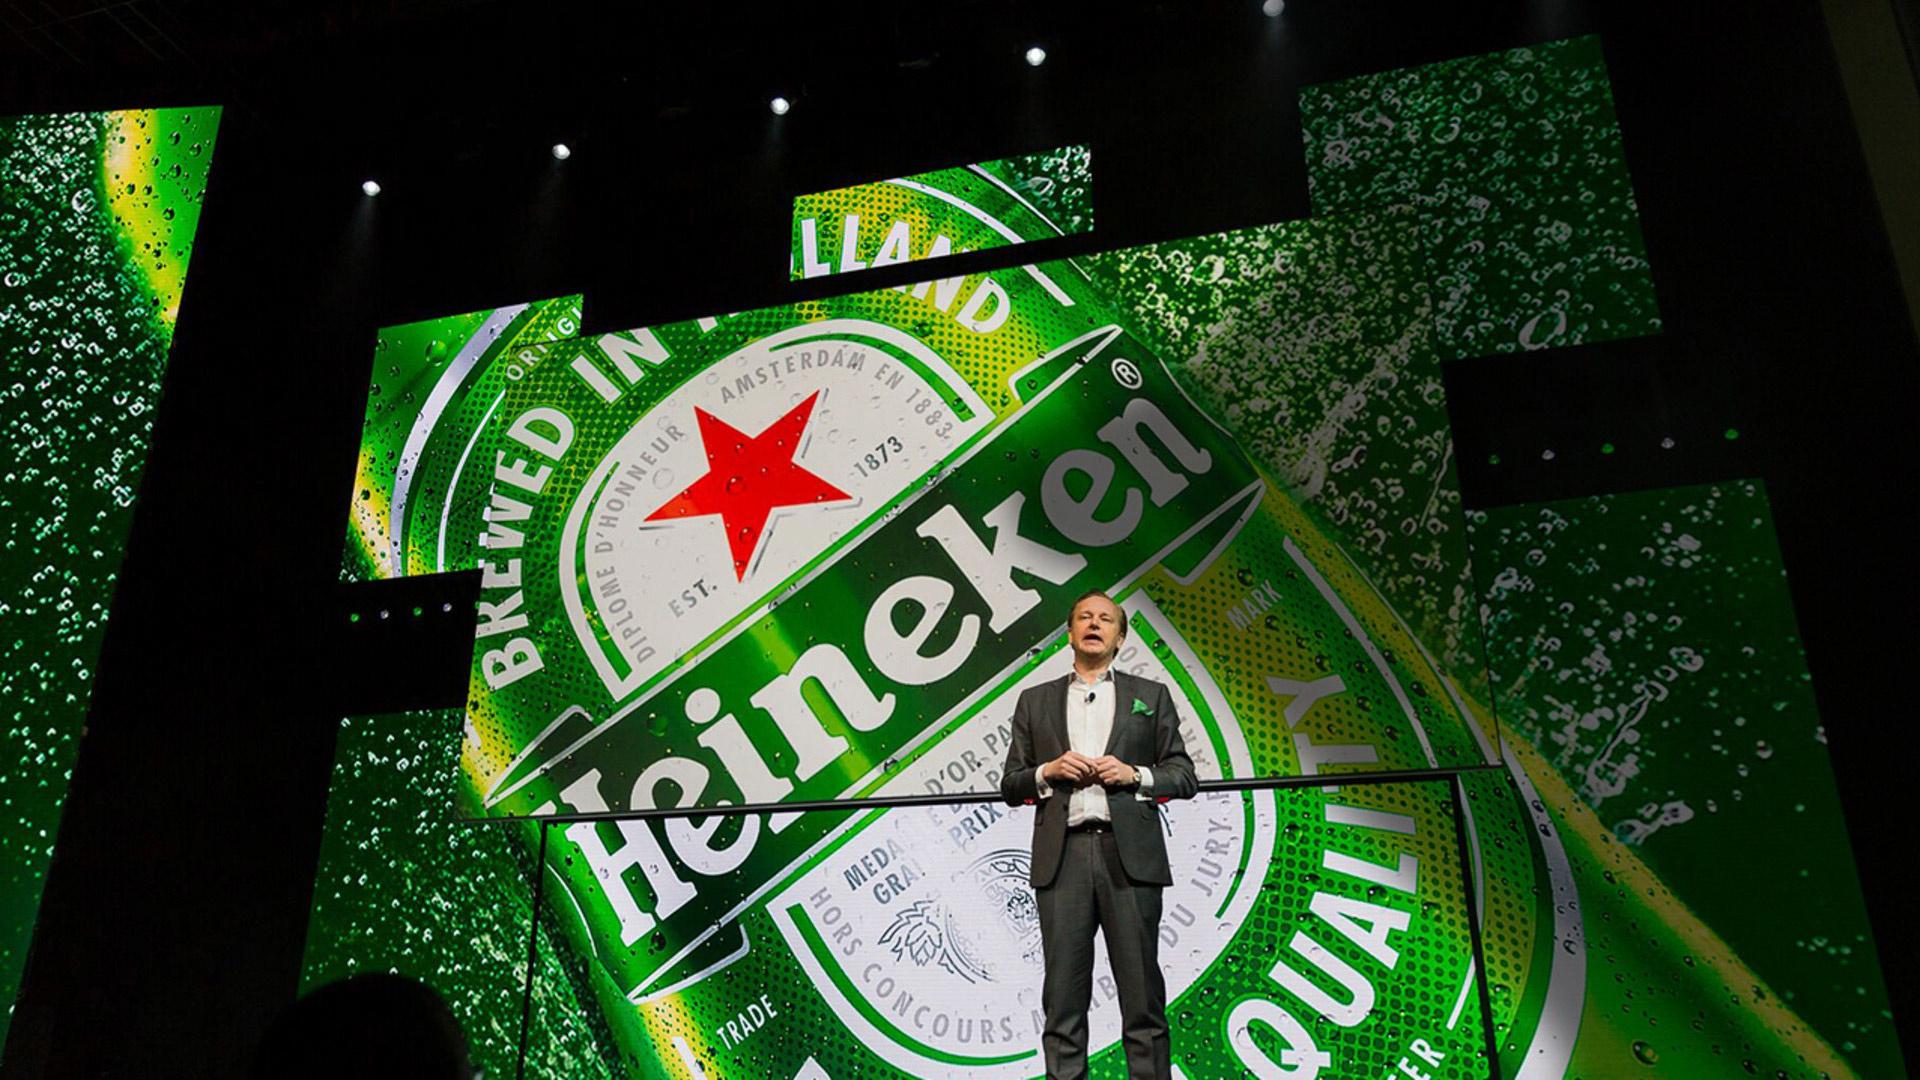 Heinekenheader